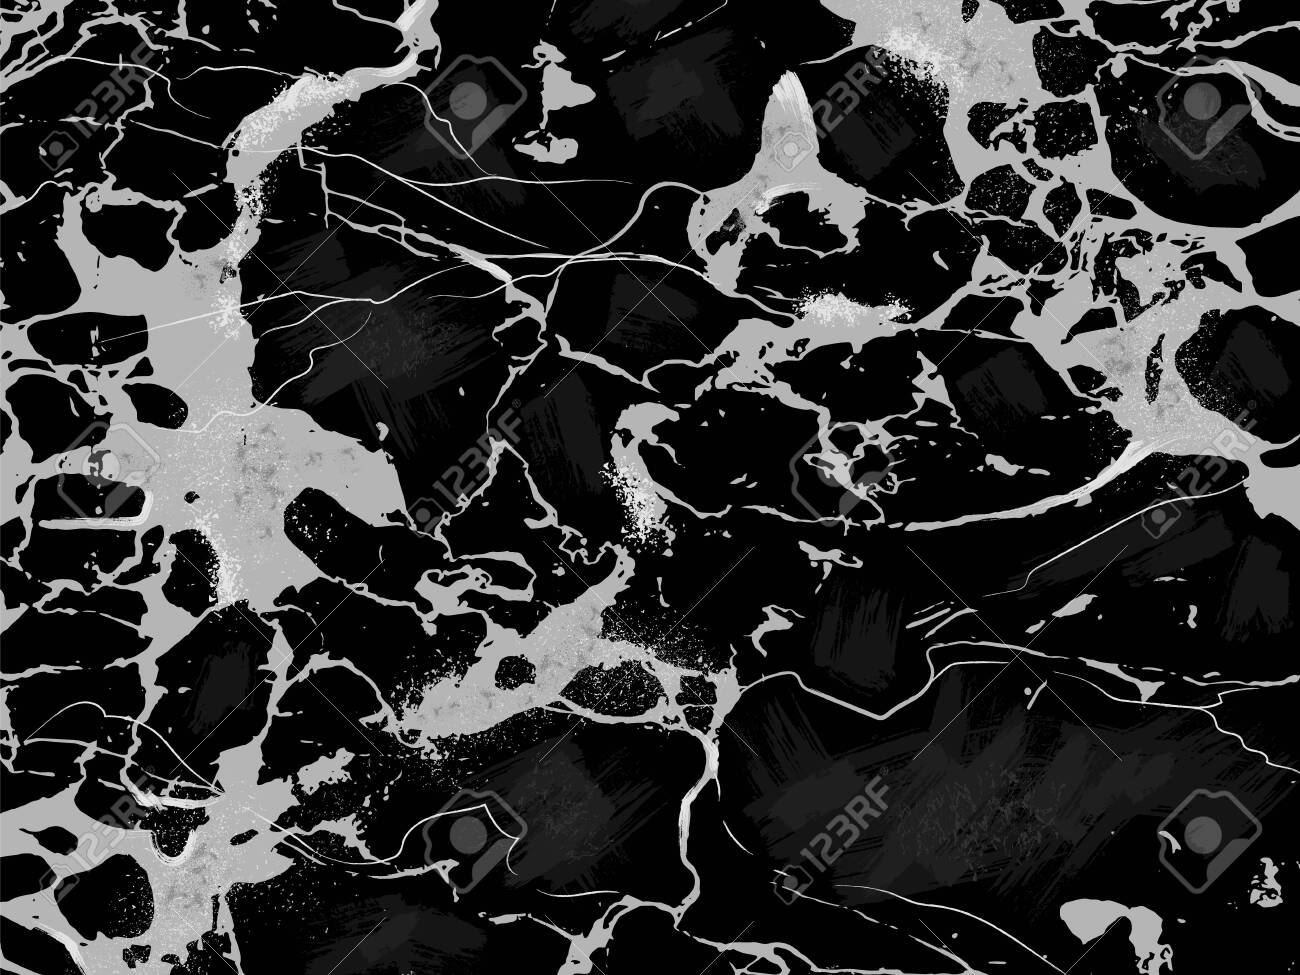 Black Marble Texture Horizontal Vector Background. - 123636504